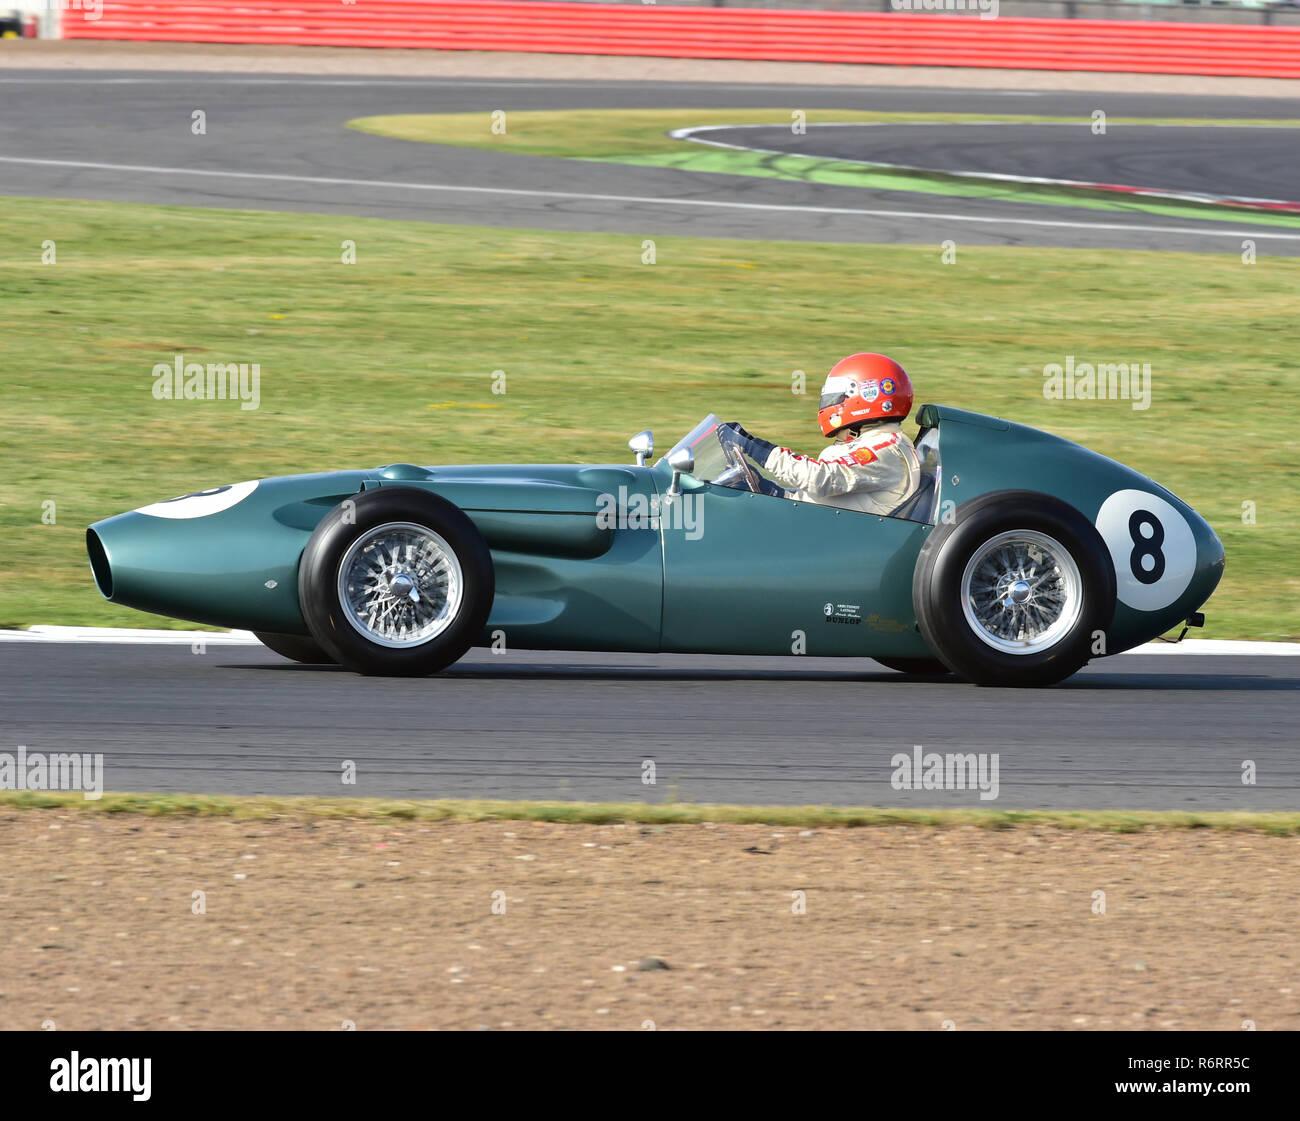 Barrie 'Whizzo' Williams, Aston Martin DBR4, Pre 61, Grand Prix cars, HGPCA, Maserati Centenary Trophy, Silverstone Classic 2014, 2014, Classic Racing Stock Photo